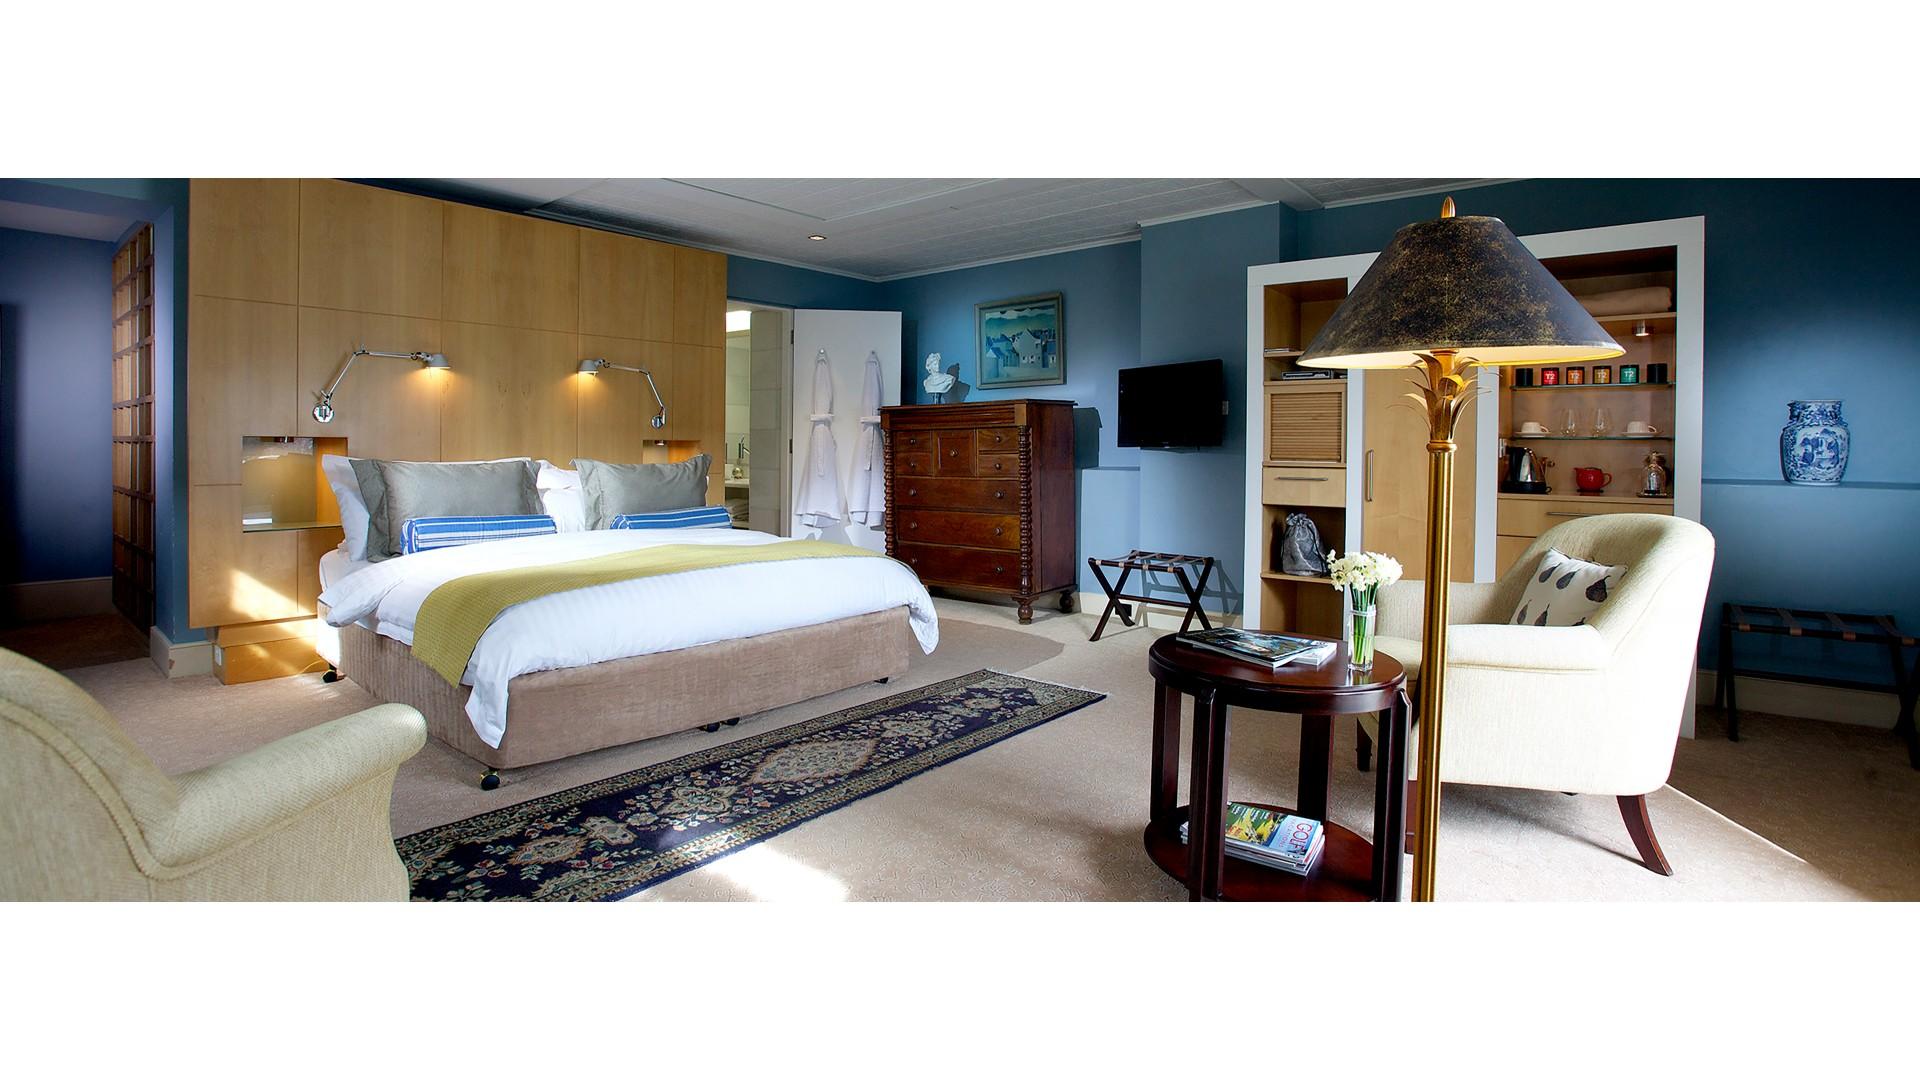 The Islington Hotel